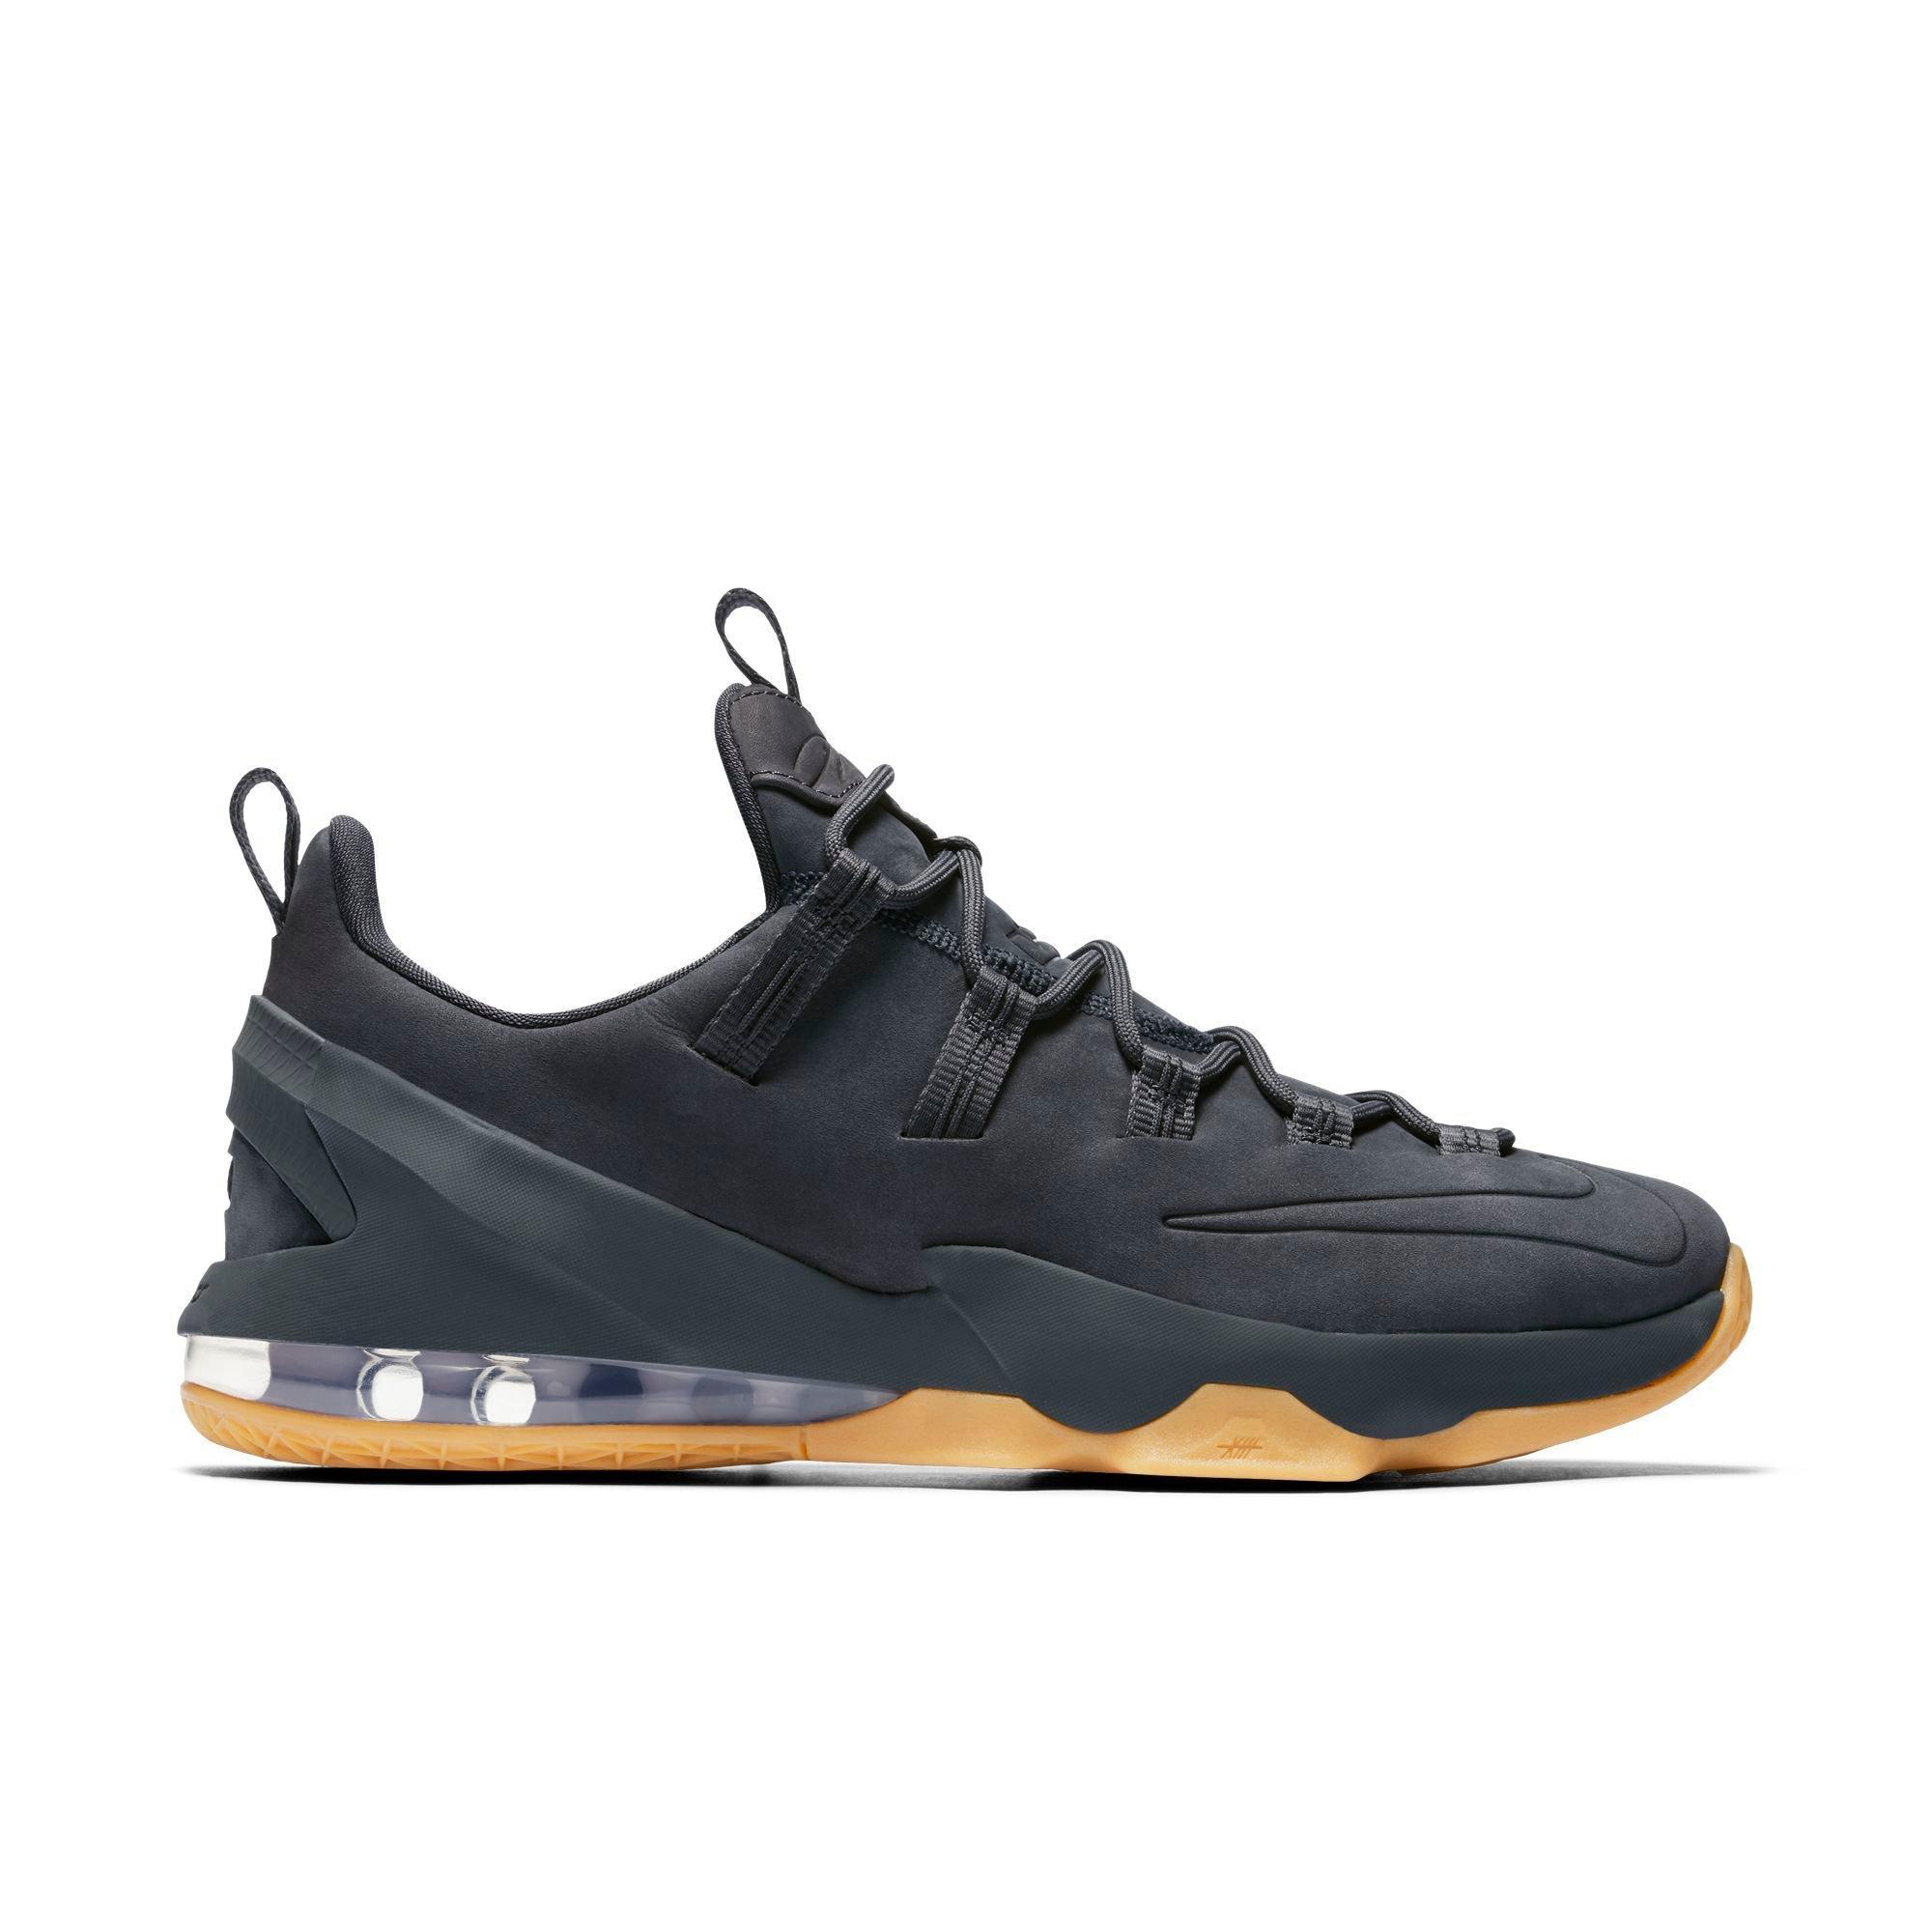 Nike Flyknit Racer Men\u0027s Running Shoe. Standard Price$150.00 Sale  Price$134.95.: (0)